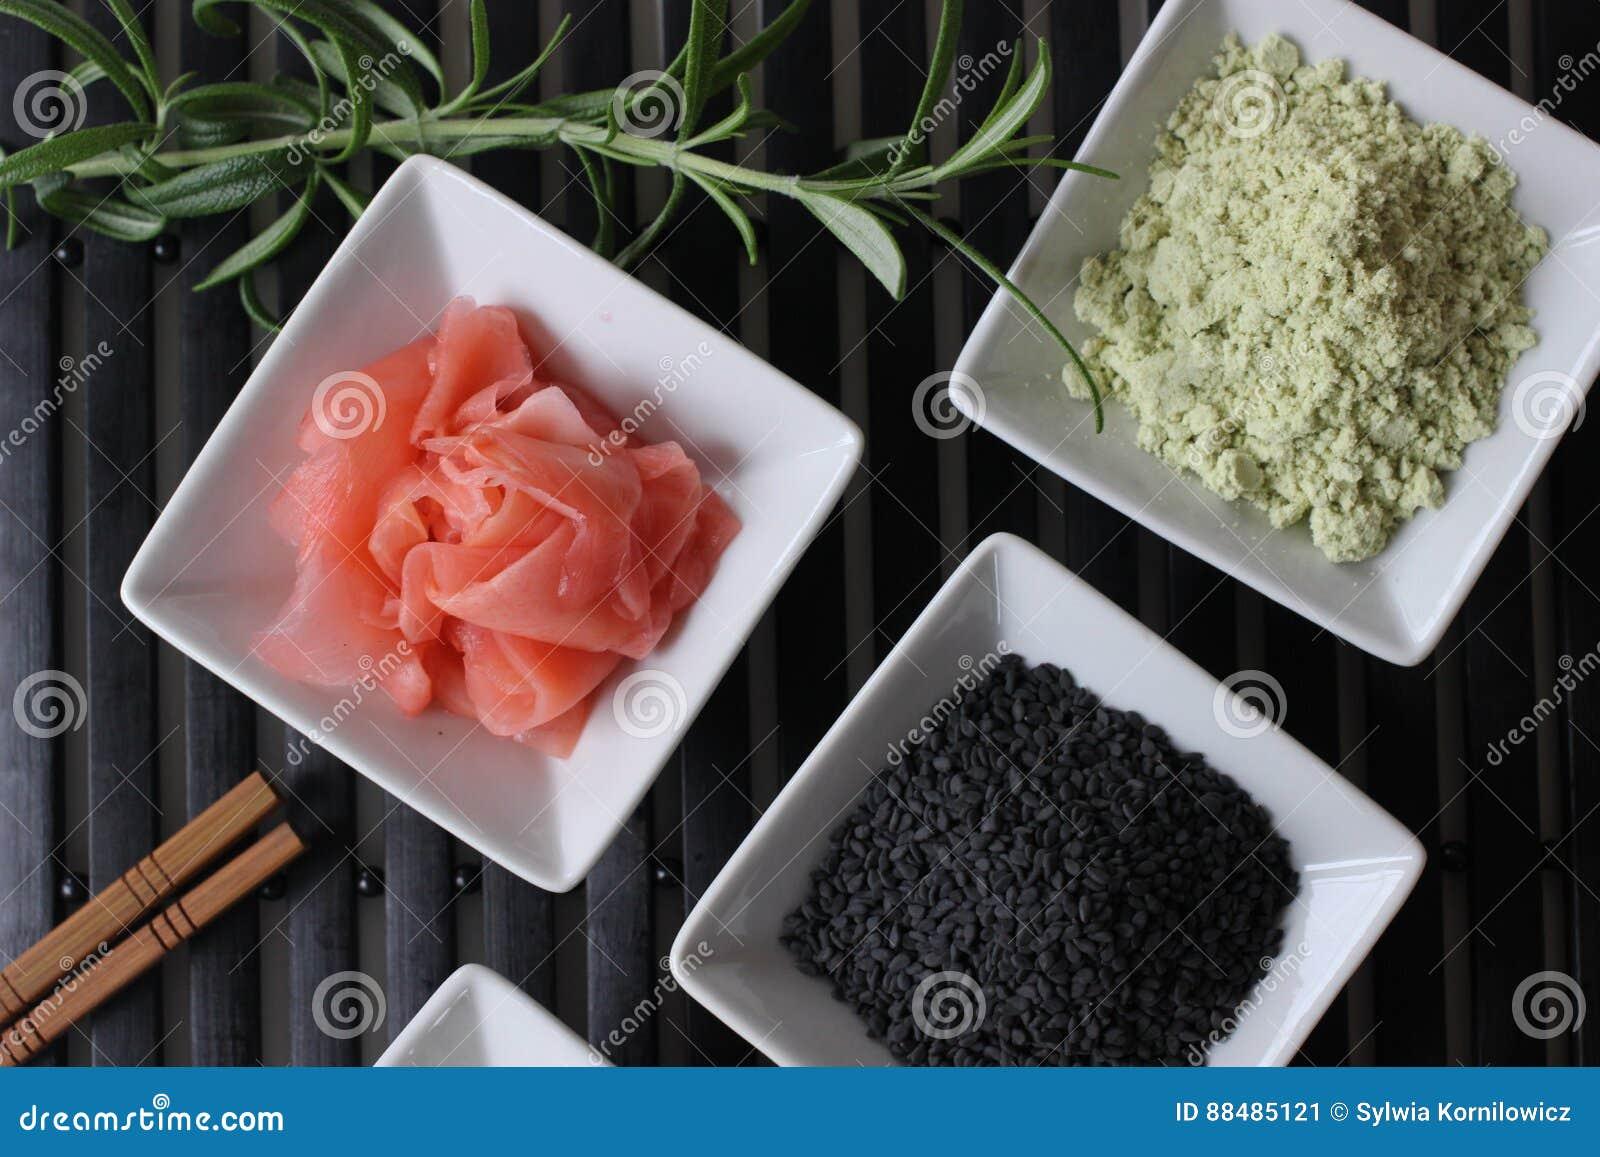 подготавливающ суши, подготавливающ японскую еду, делающ суши, делая японскую еду,